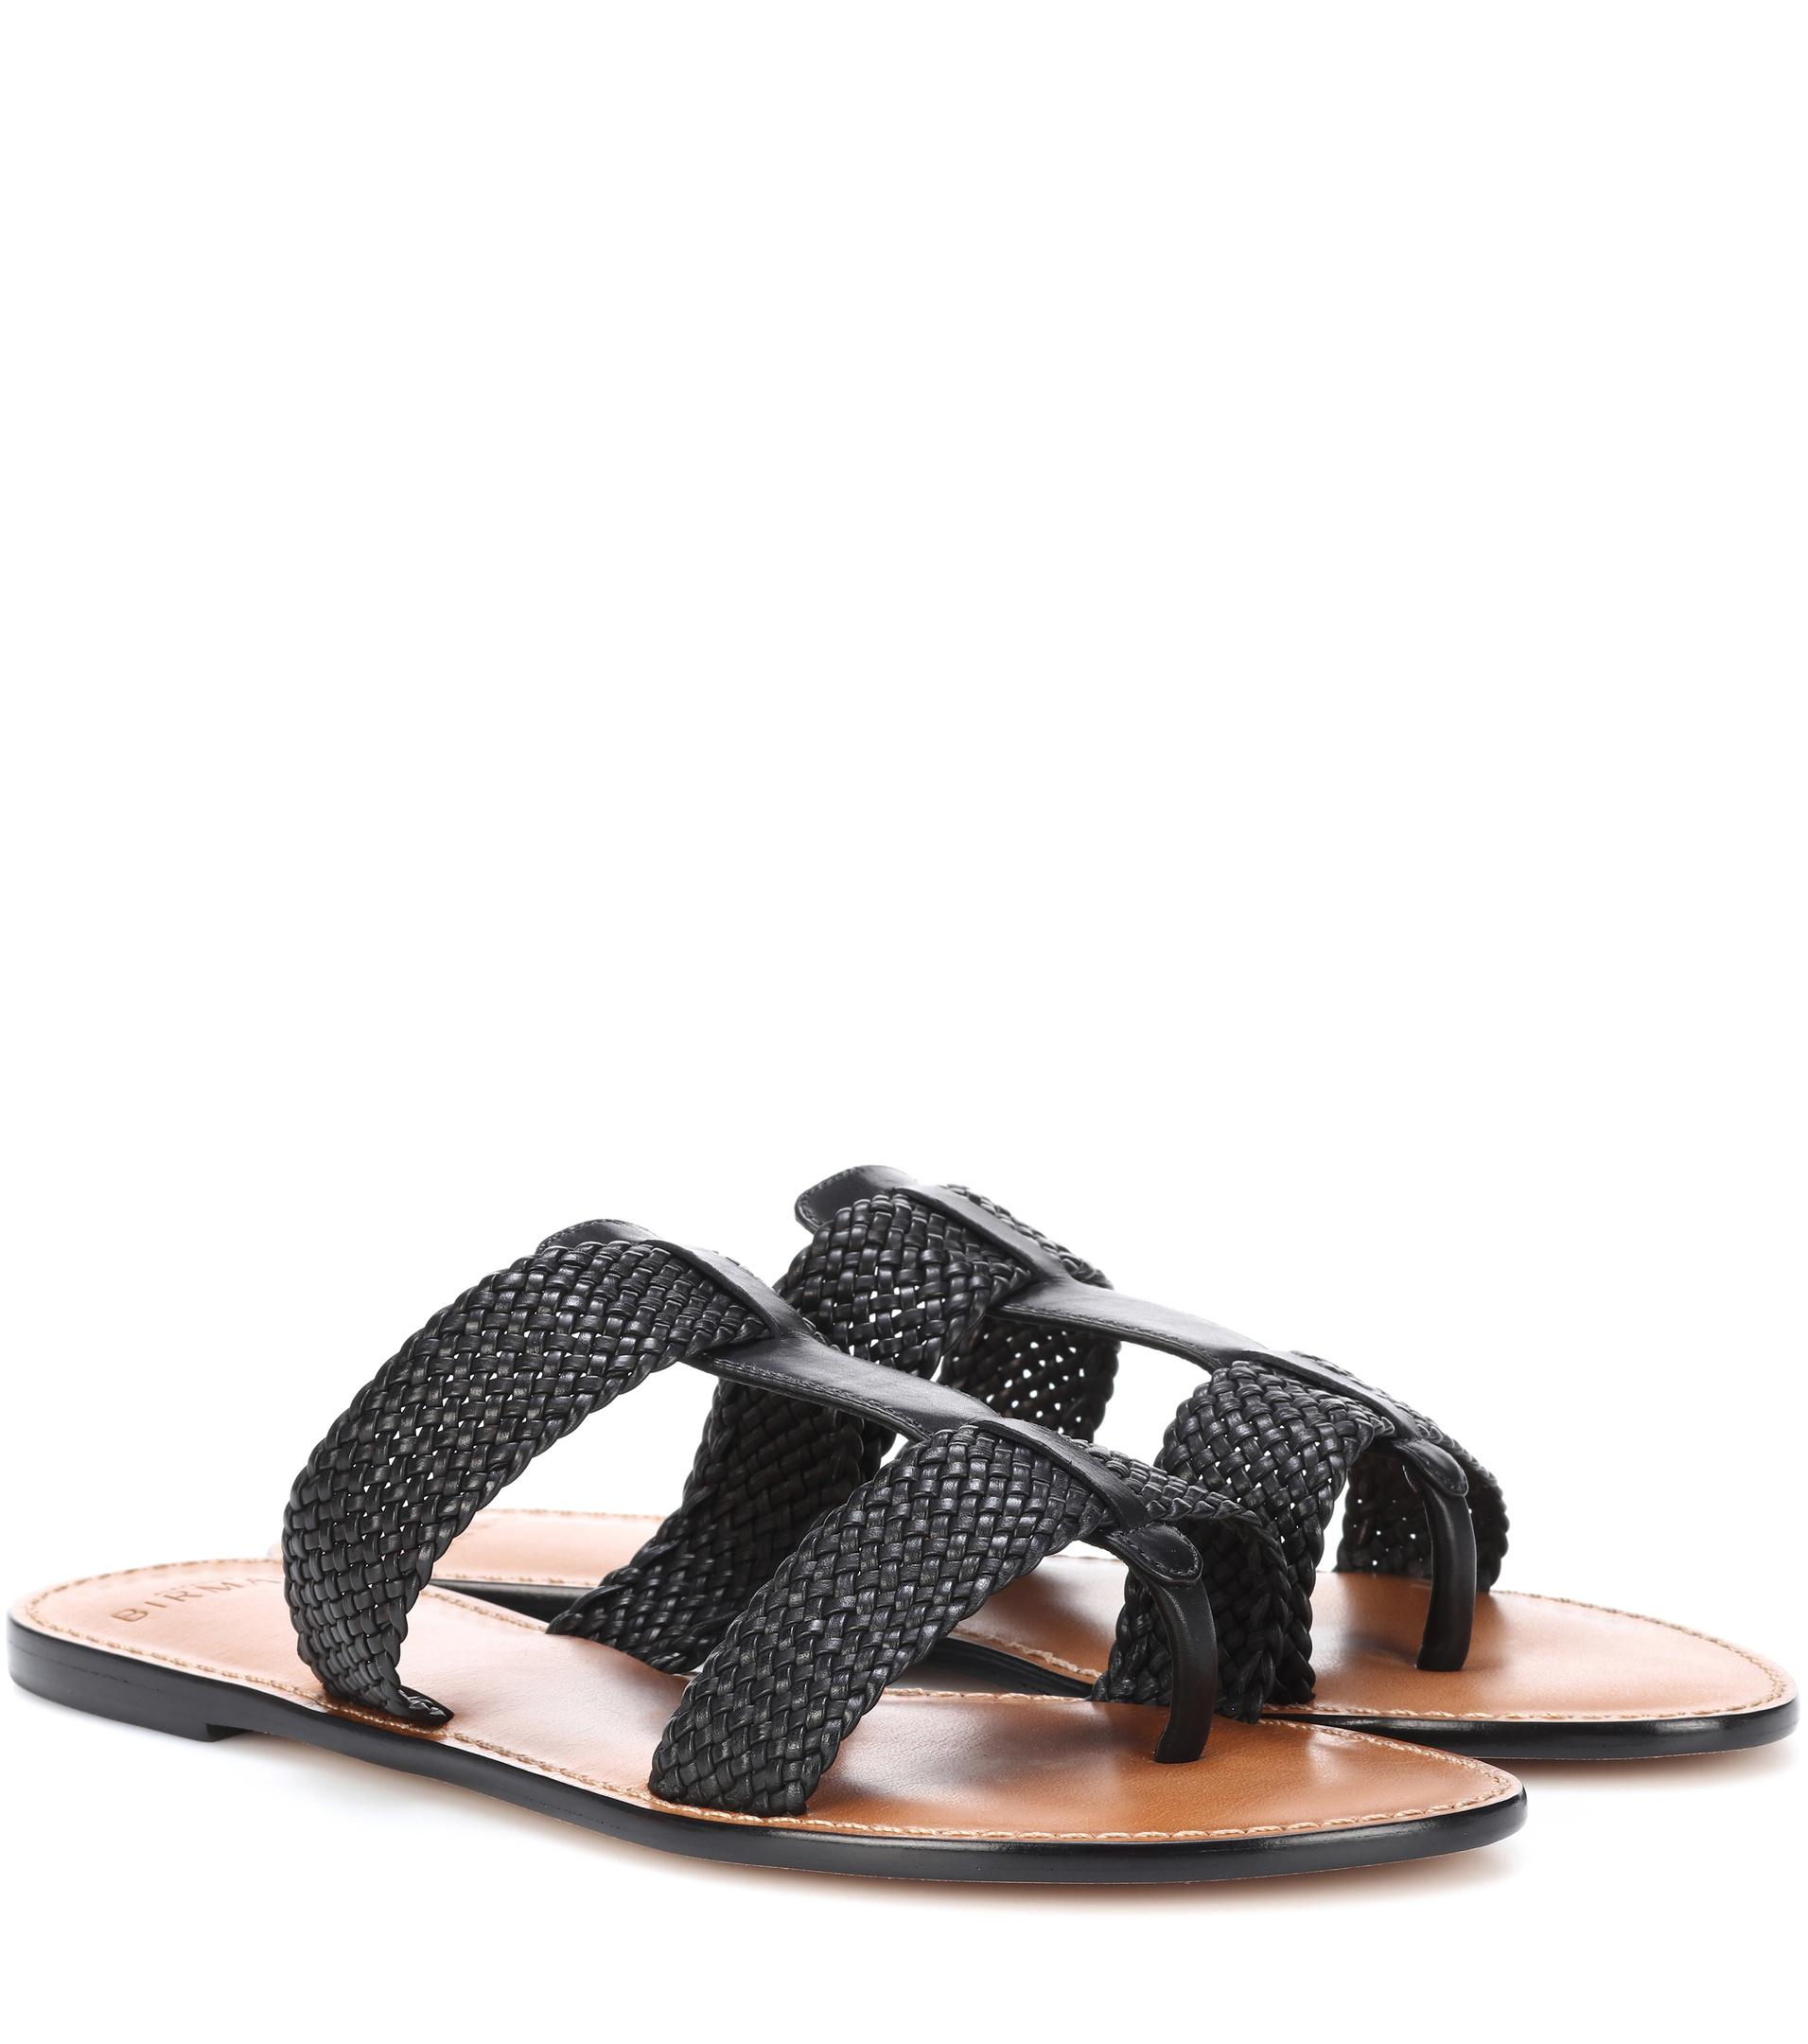 footlocker cheap price Alexandre Birman Woven Slide Sandals cheap sale really 38FZWTJg